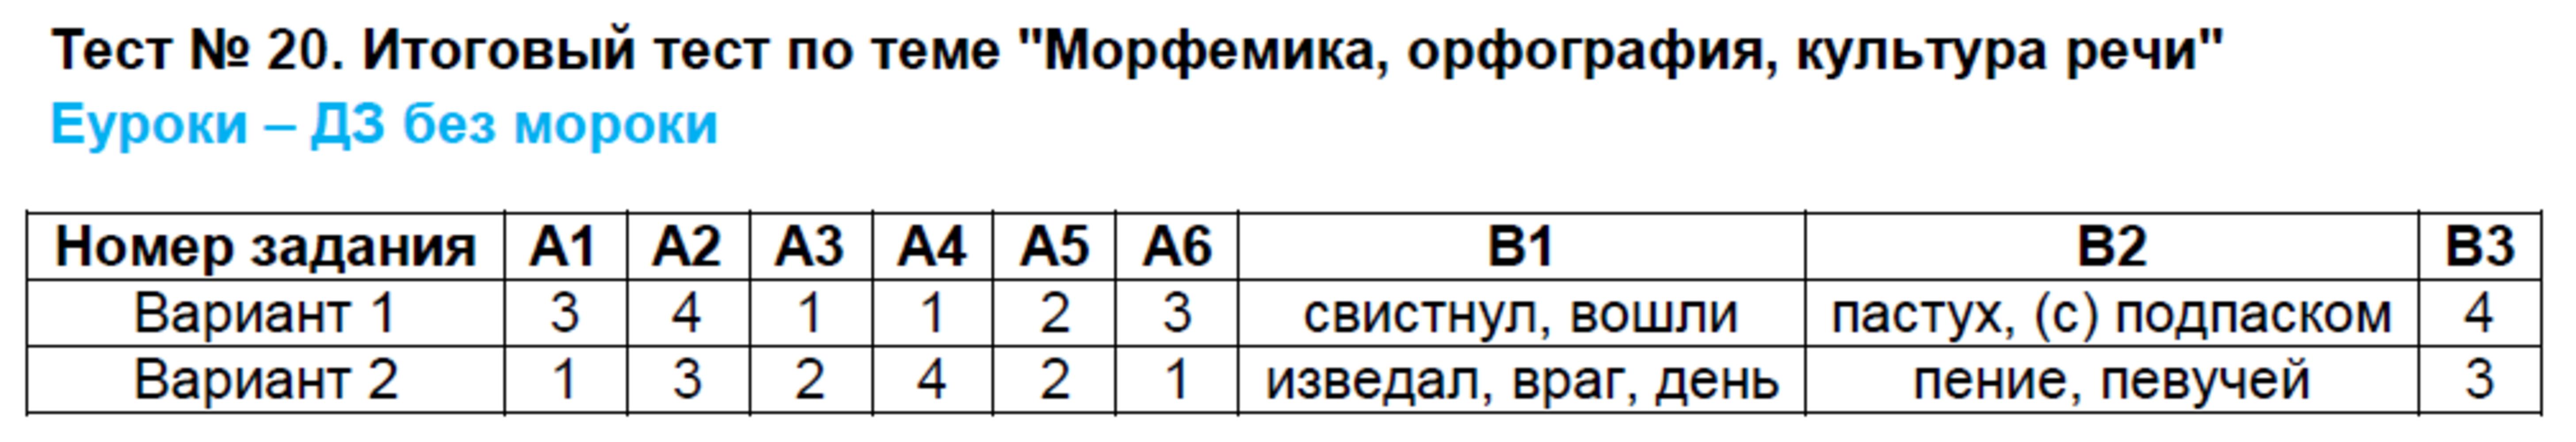 Морфемика 5 класс гдз